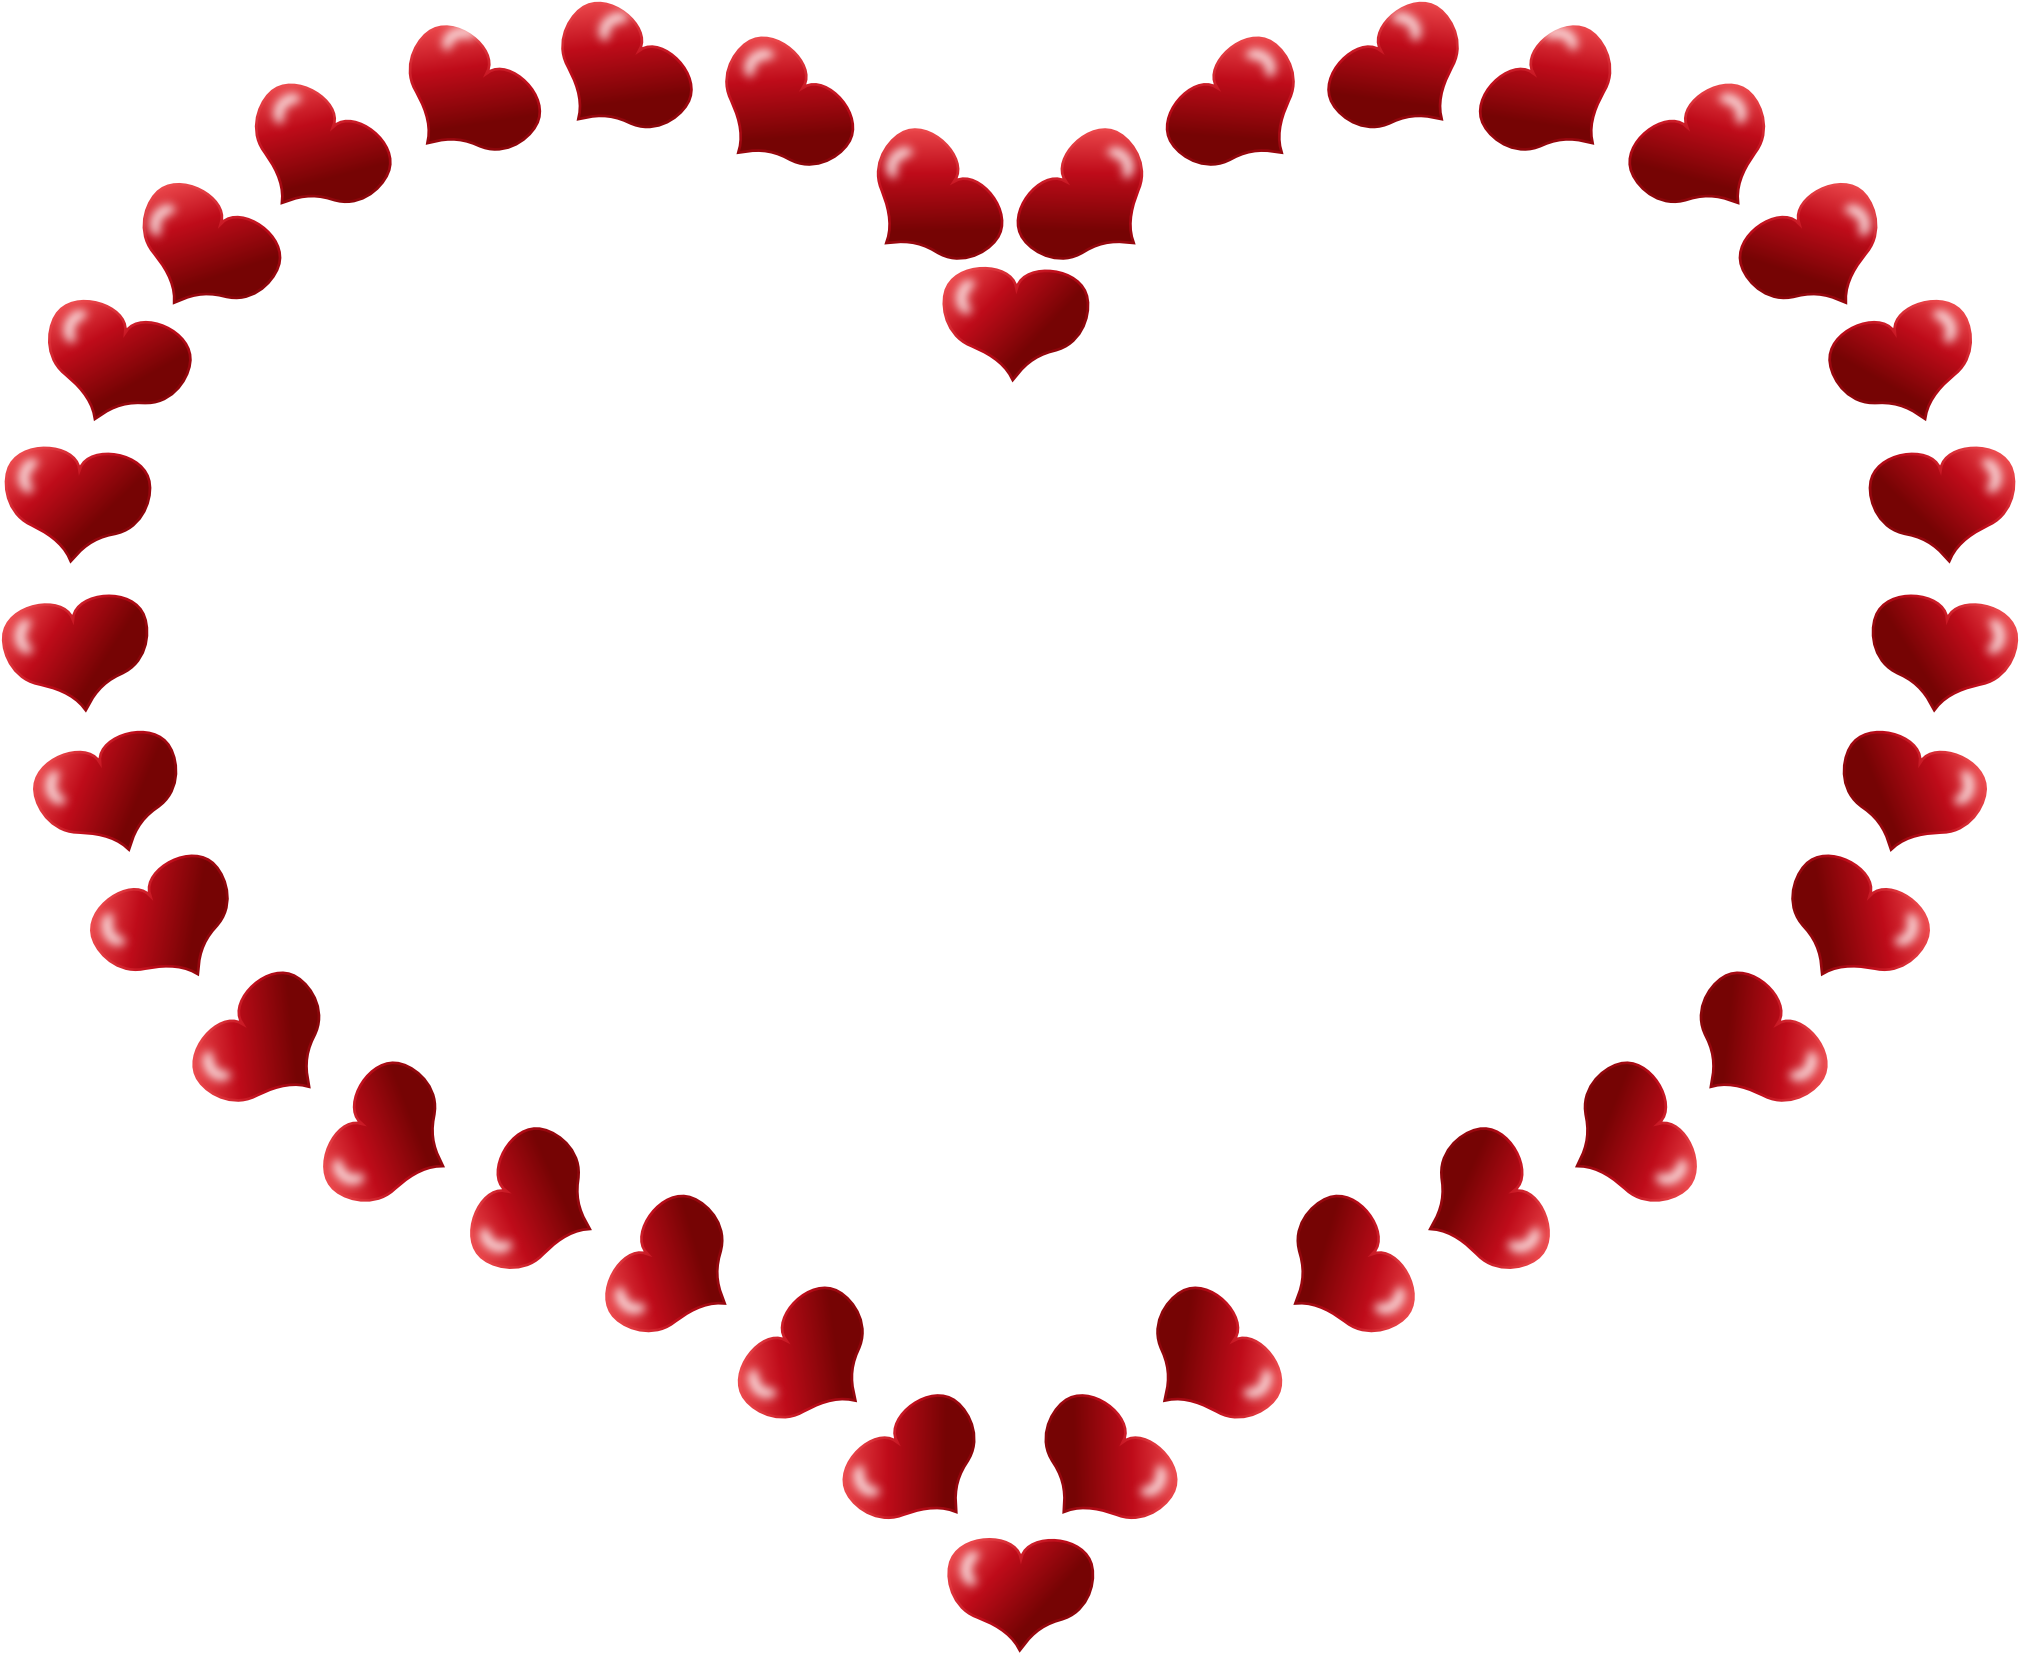 Heart-shaped clipart open heart #10